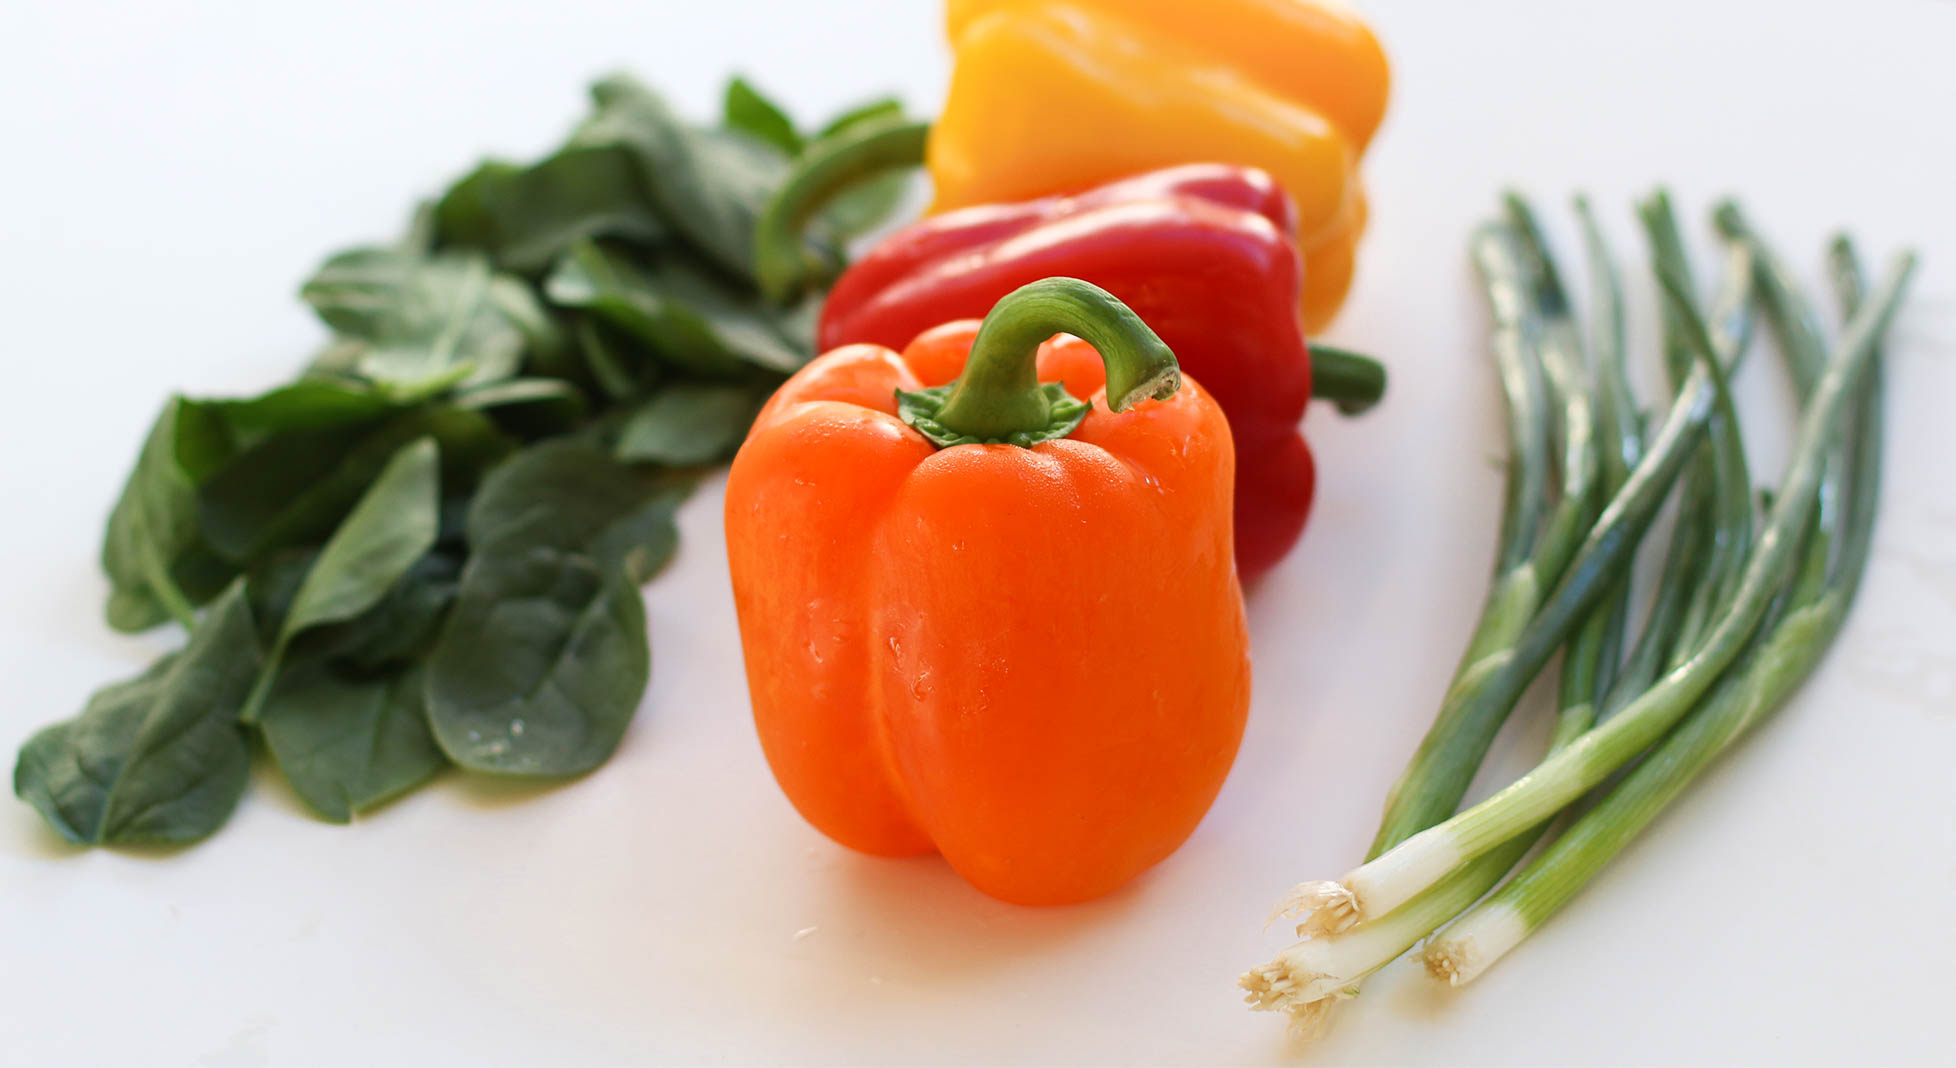 Natural Remedies: Seasonal and Environmental Changes